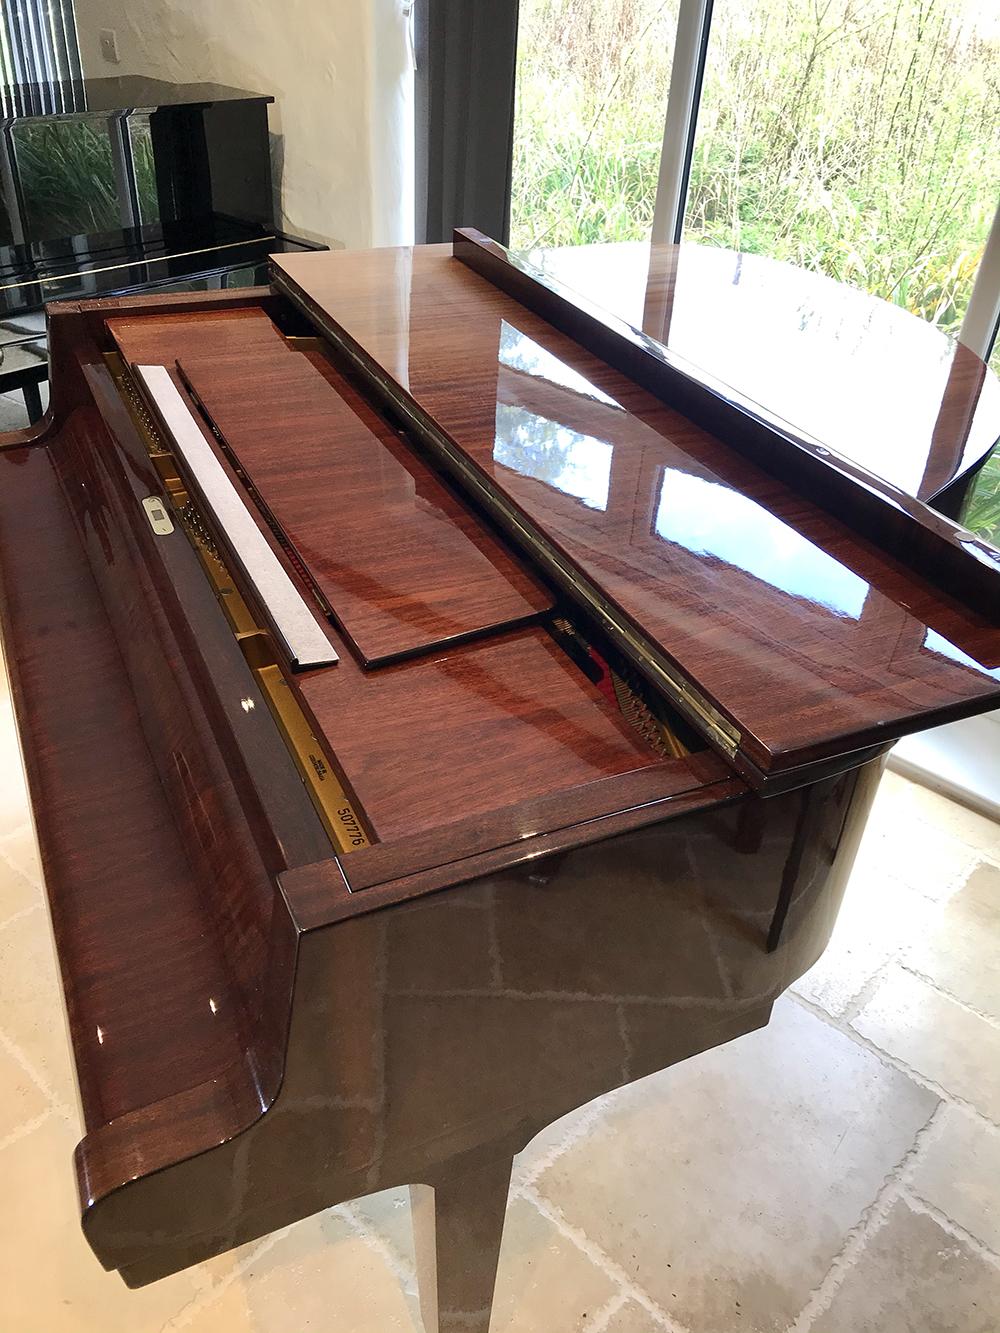 used-petrof-baby-grand-Piano-Dorset-for-sale-13.jpg